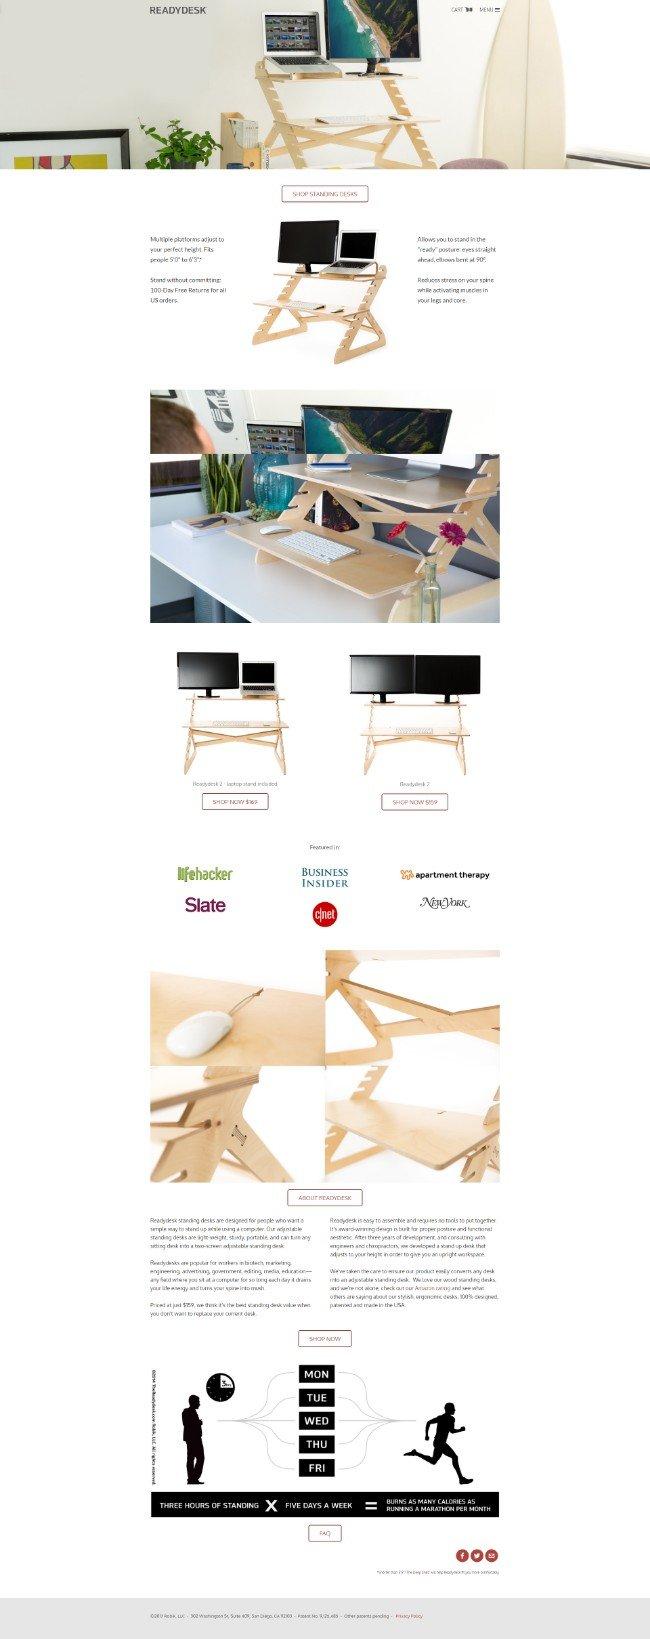 the ready desk